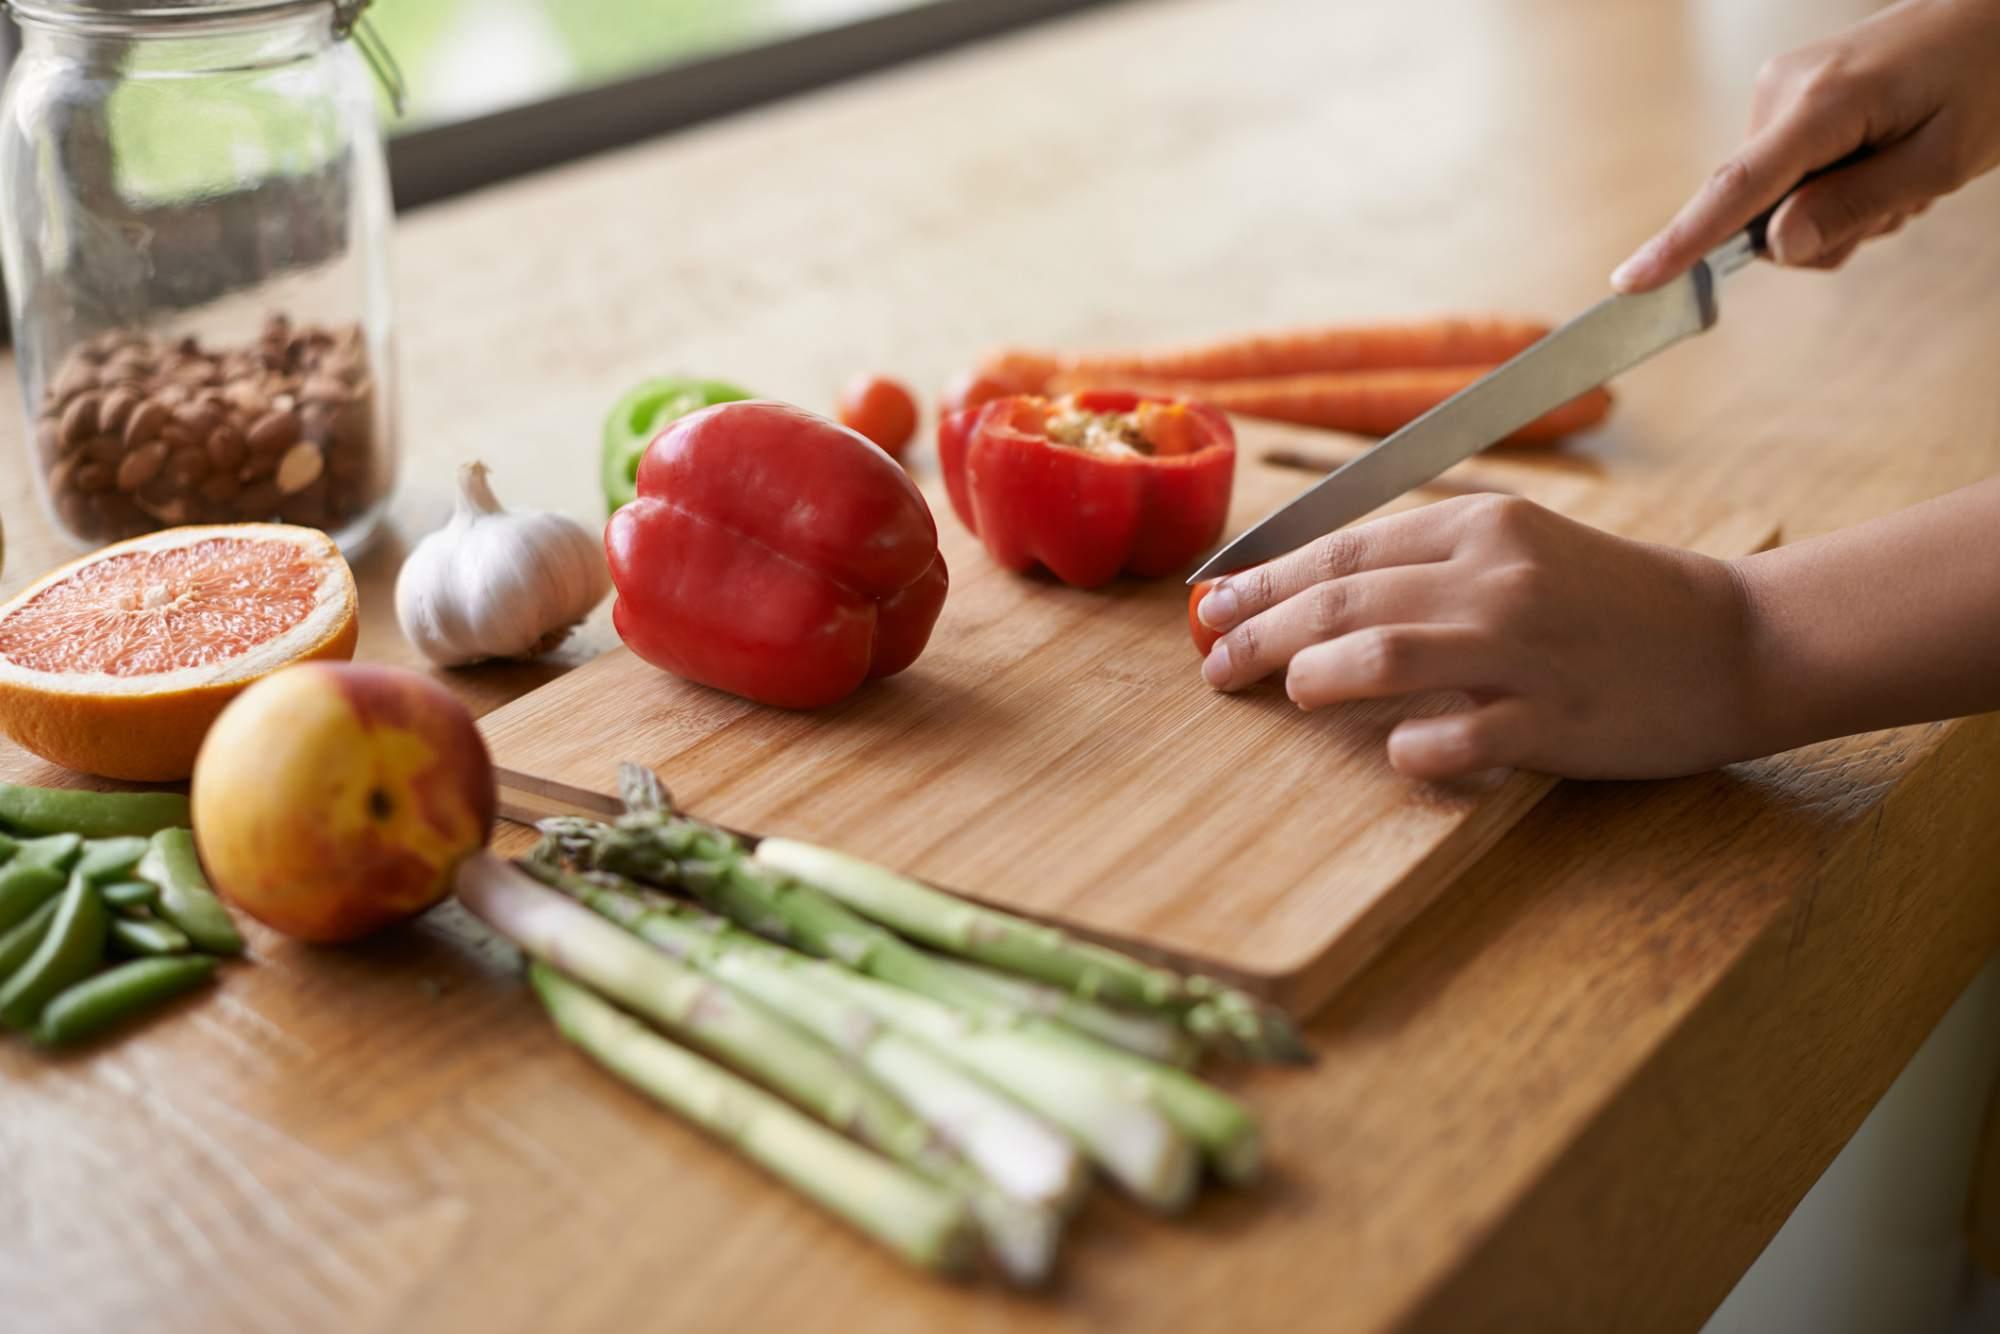 Woman cutting vegetables on a cutting board